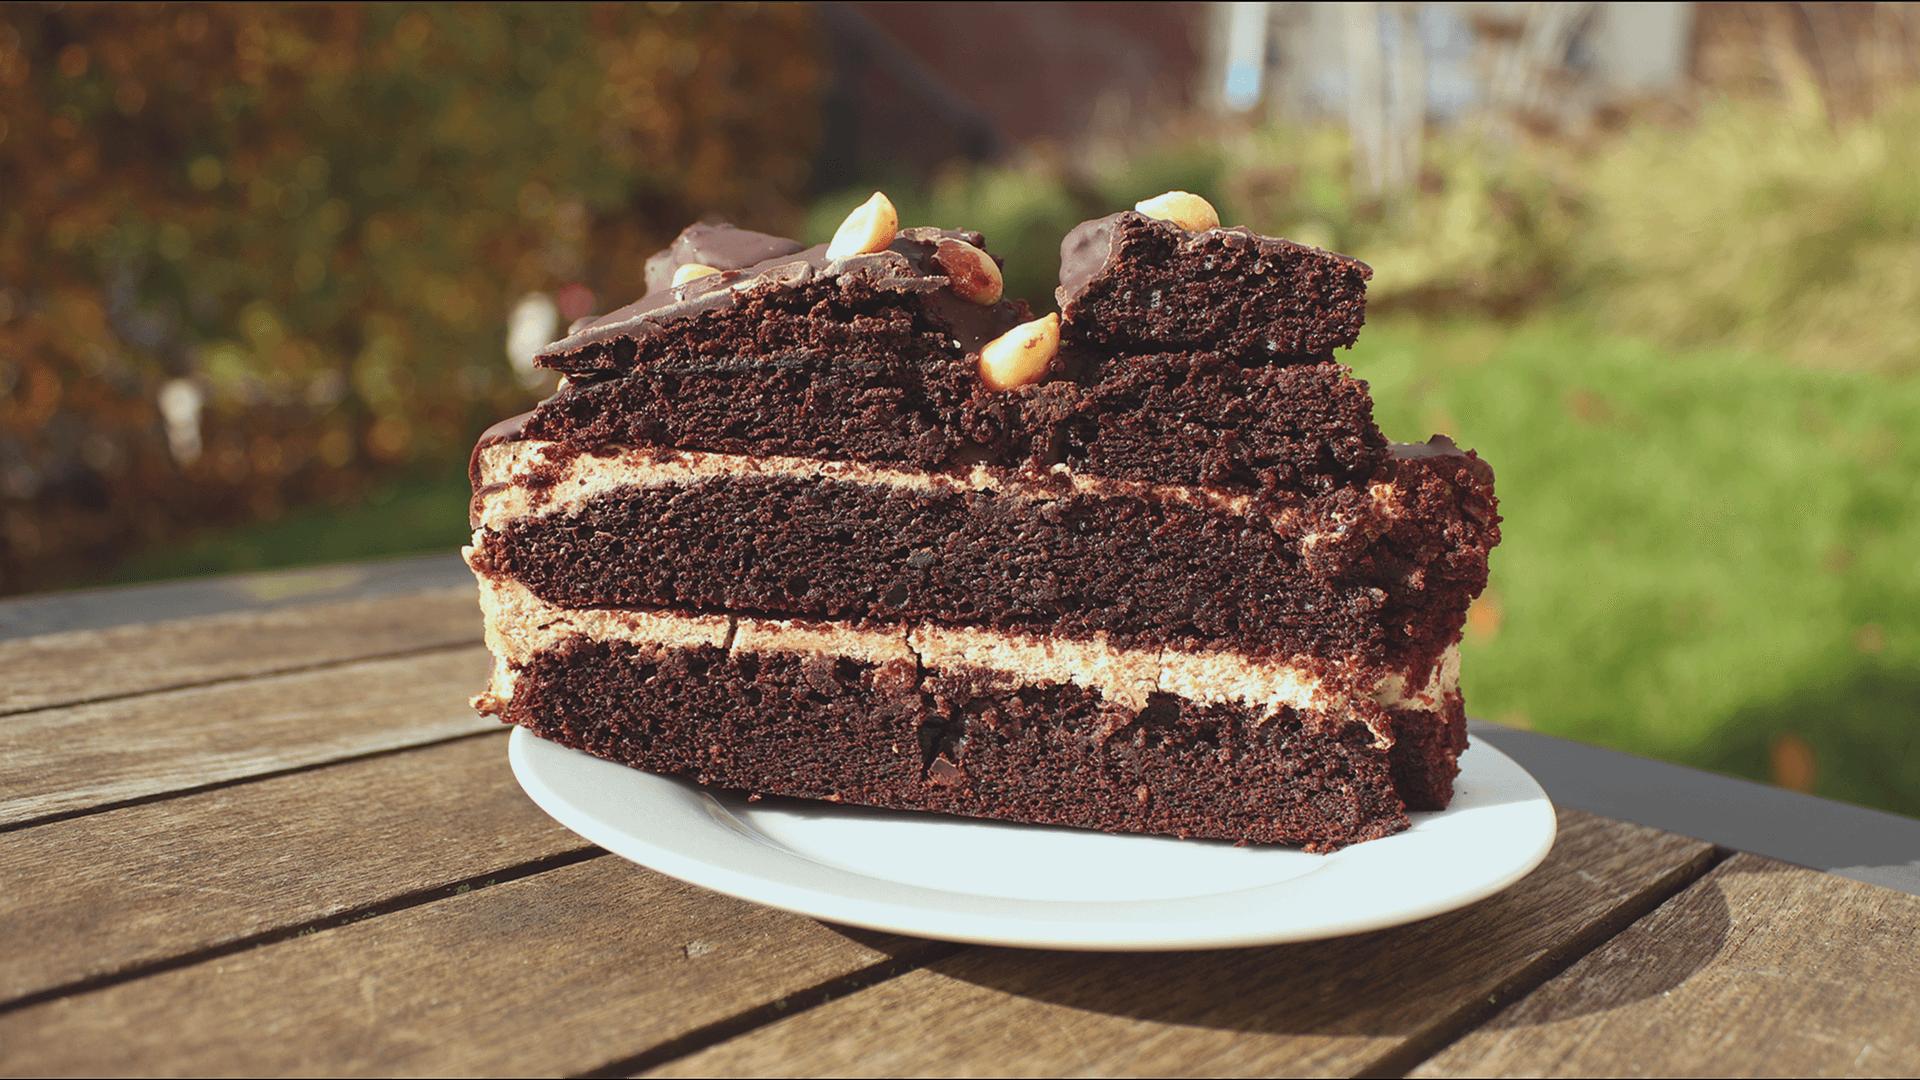 dieta dos hidratos de carbono lentos - bolo